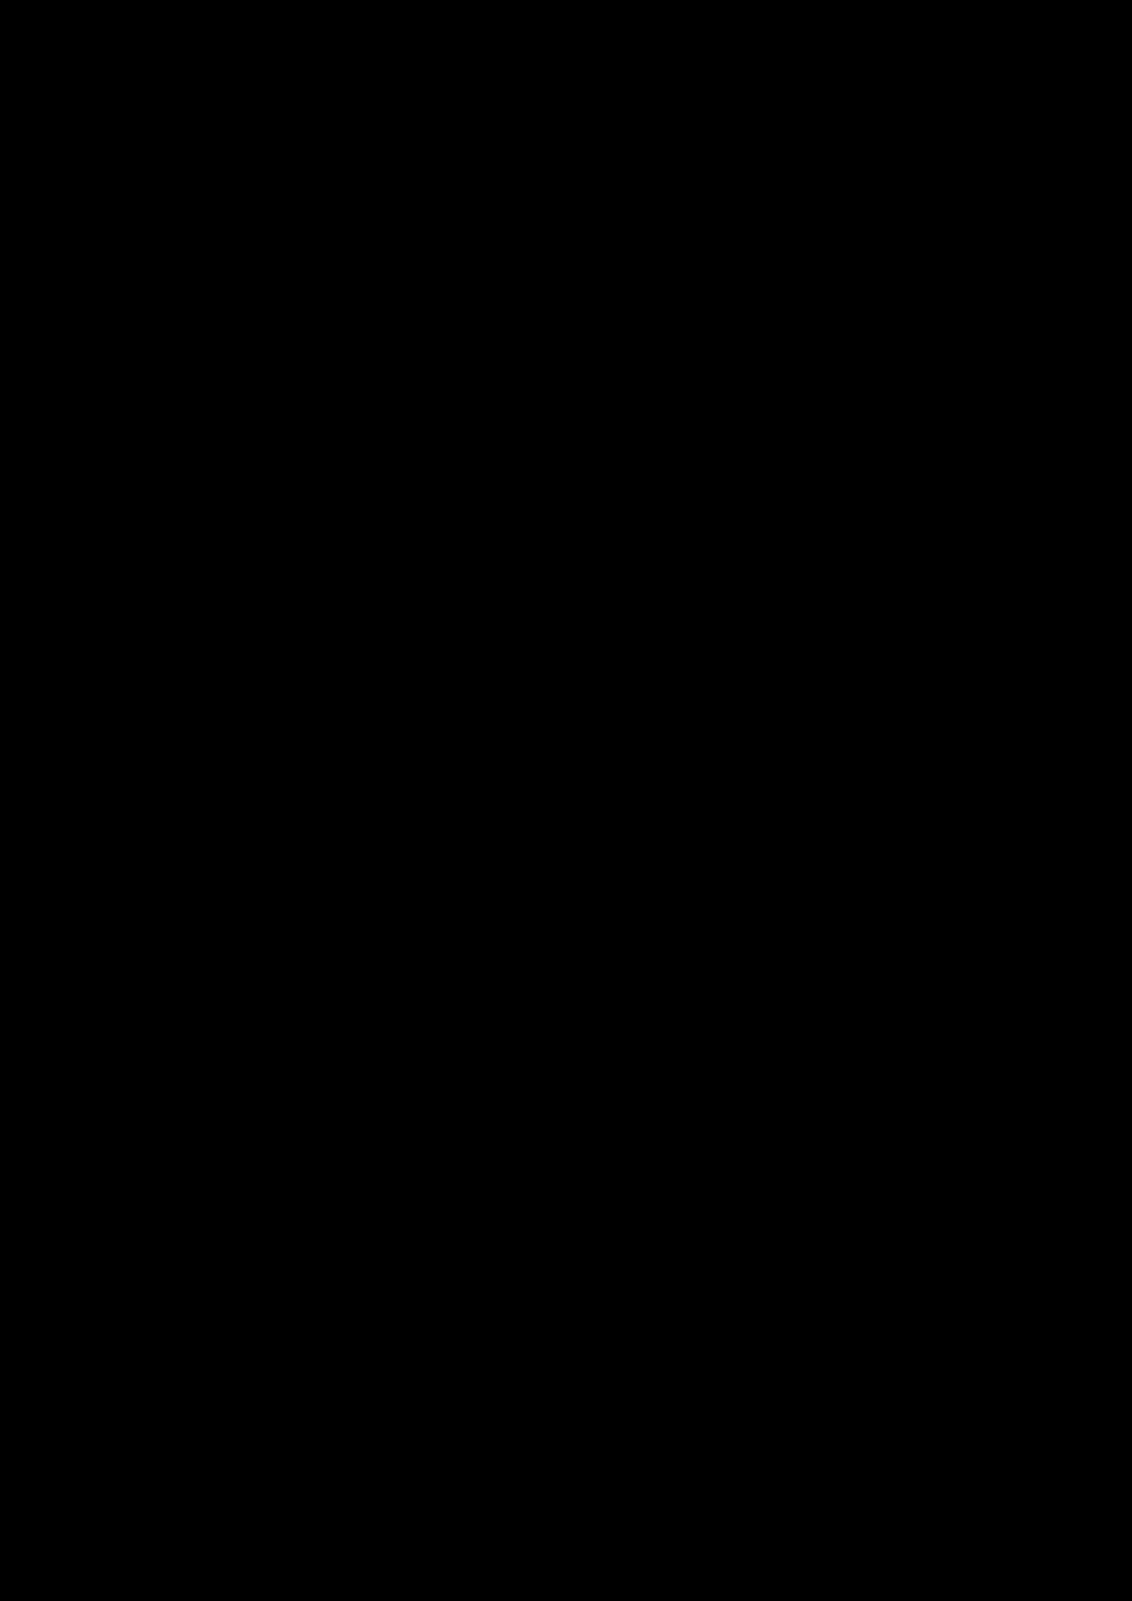 Ten lyubvi slide, Image 18